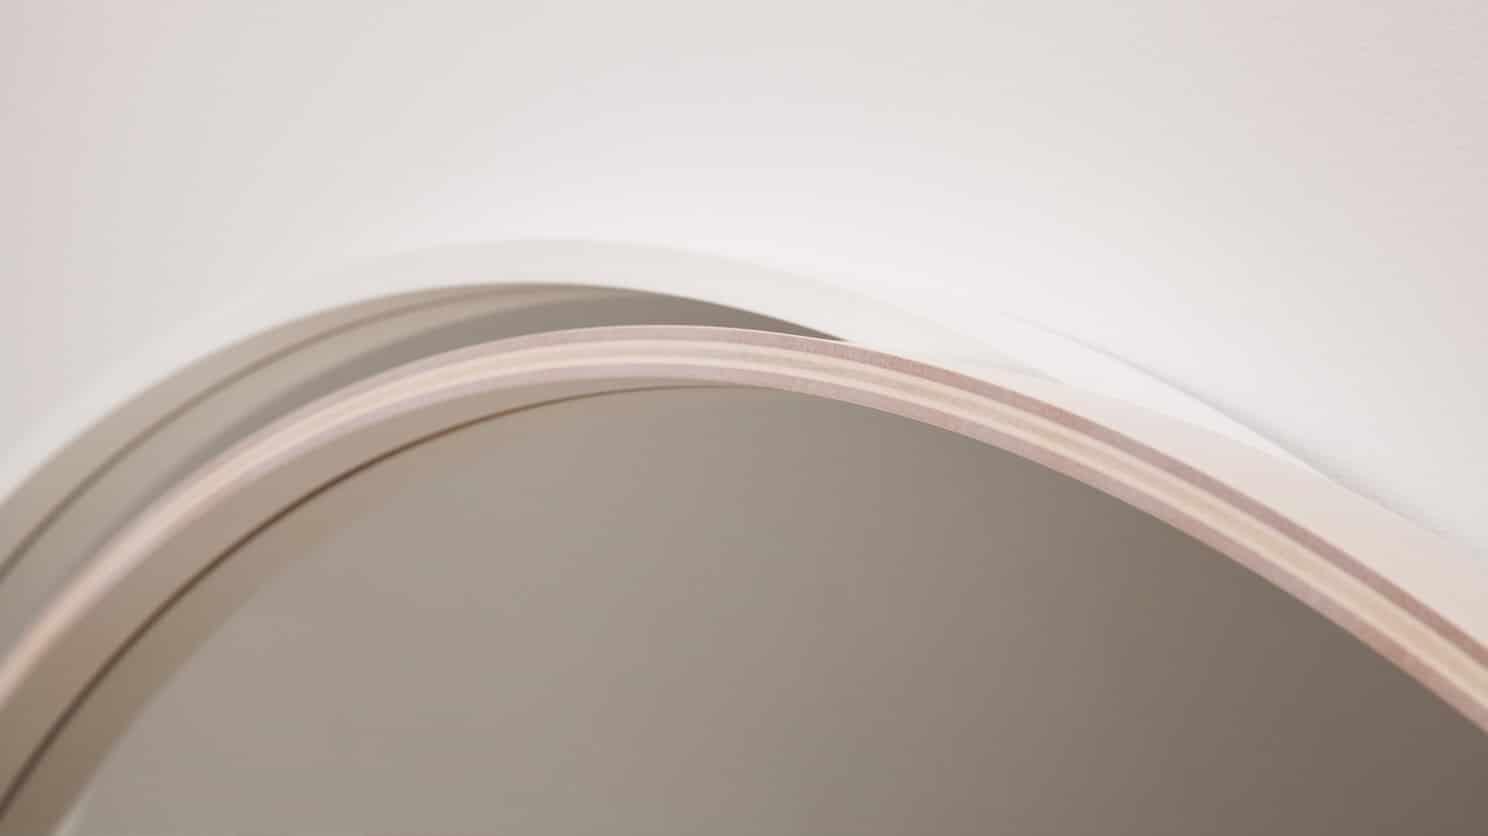 3130 043 81 5 mirror conner large ash detail